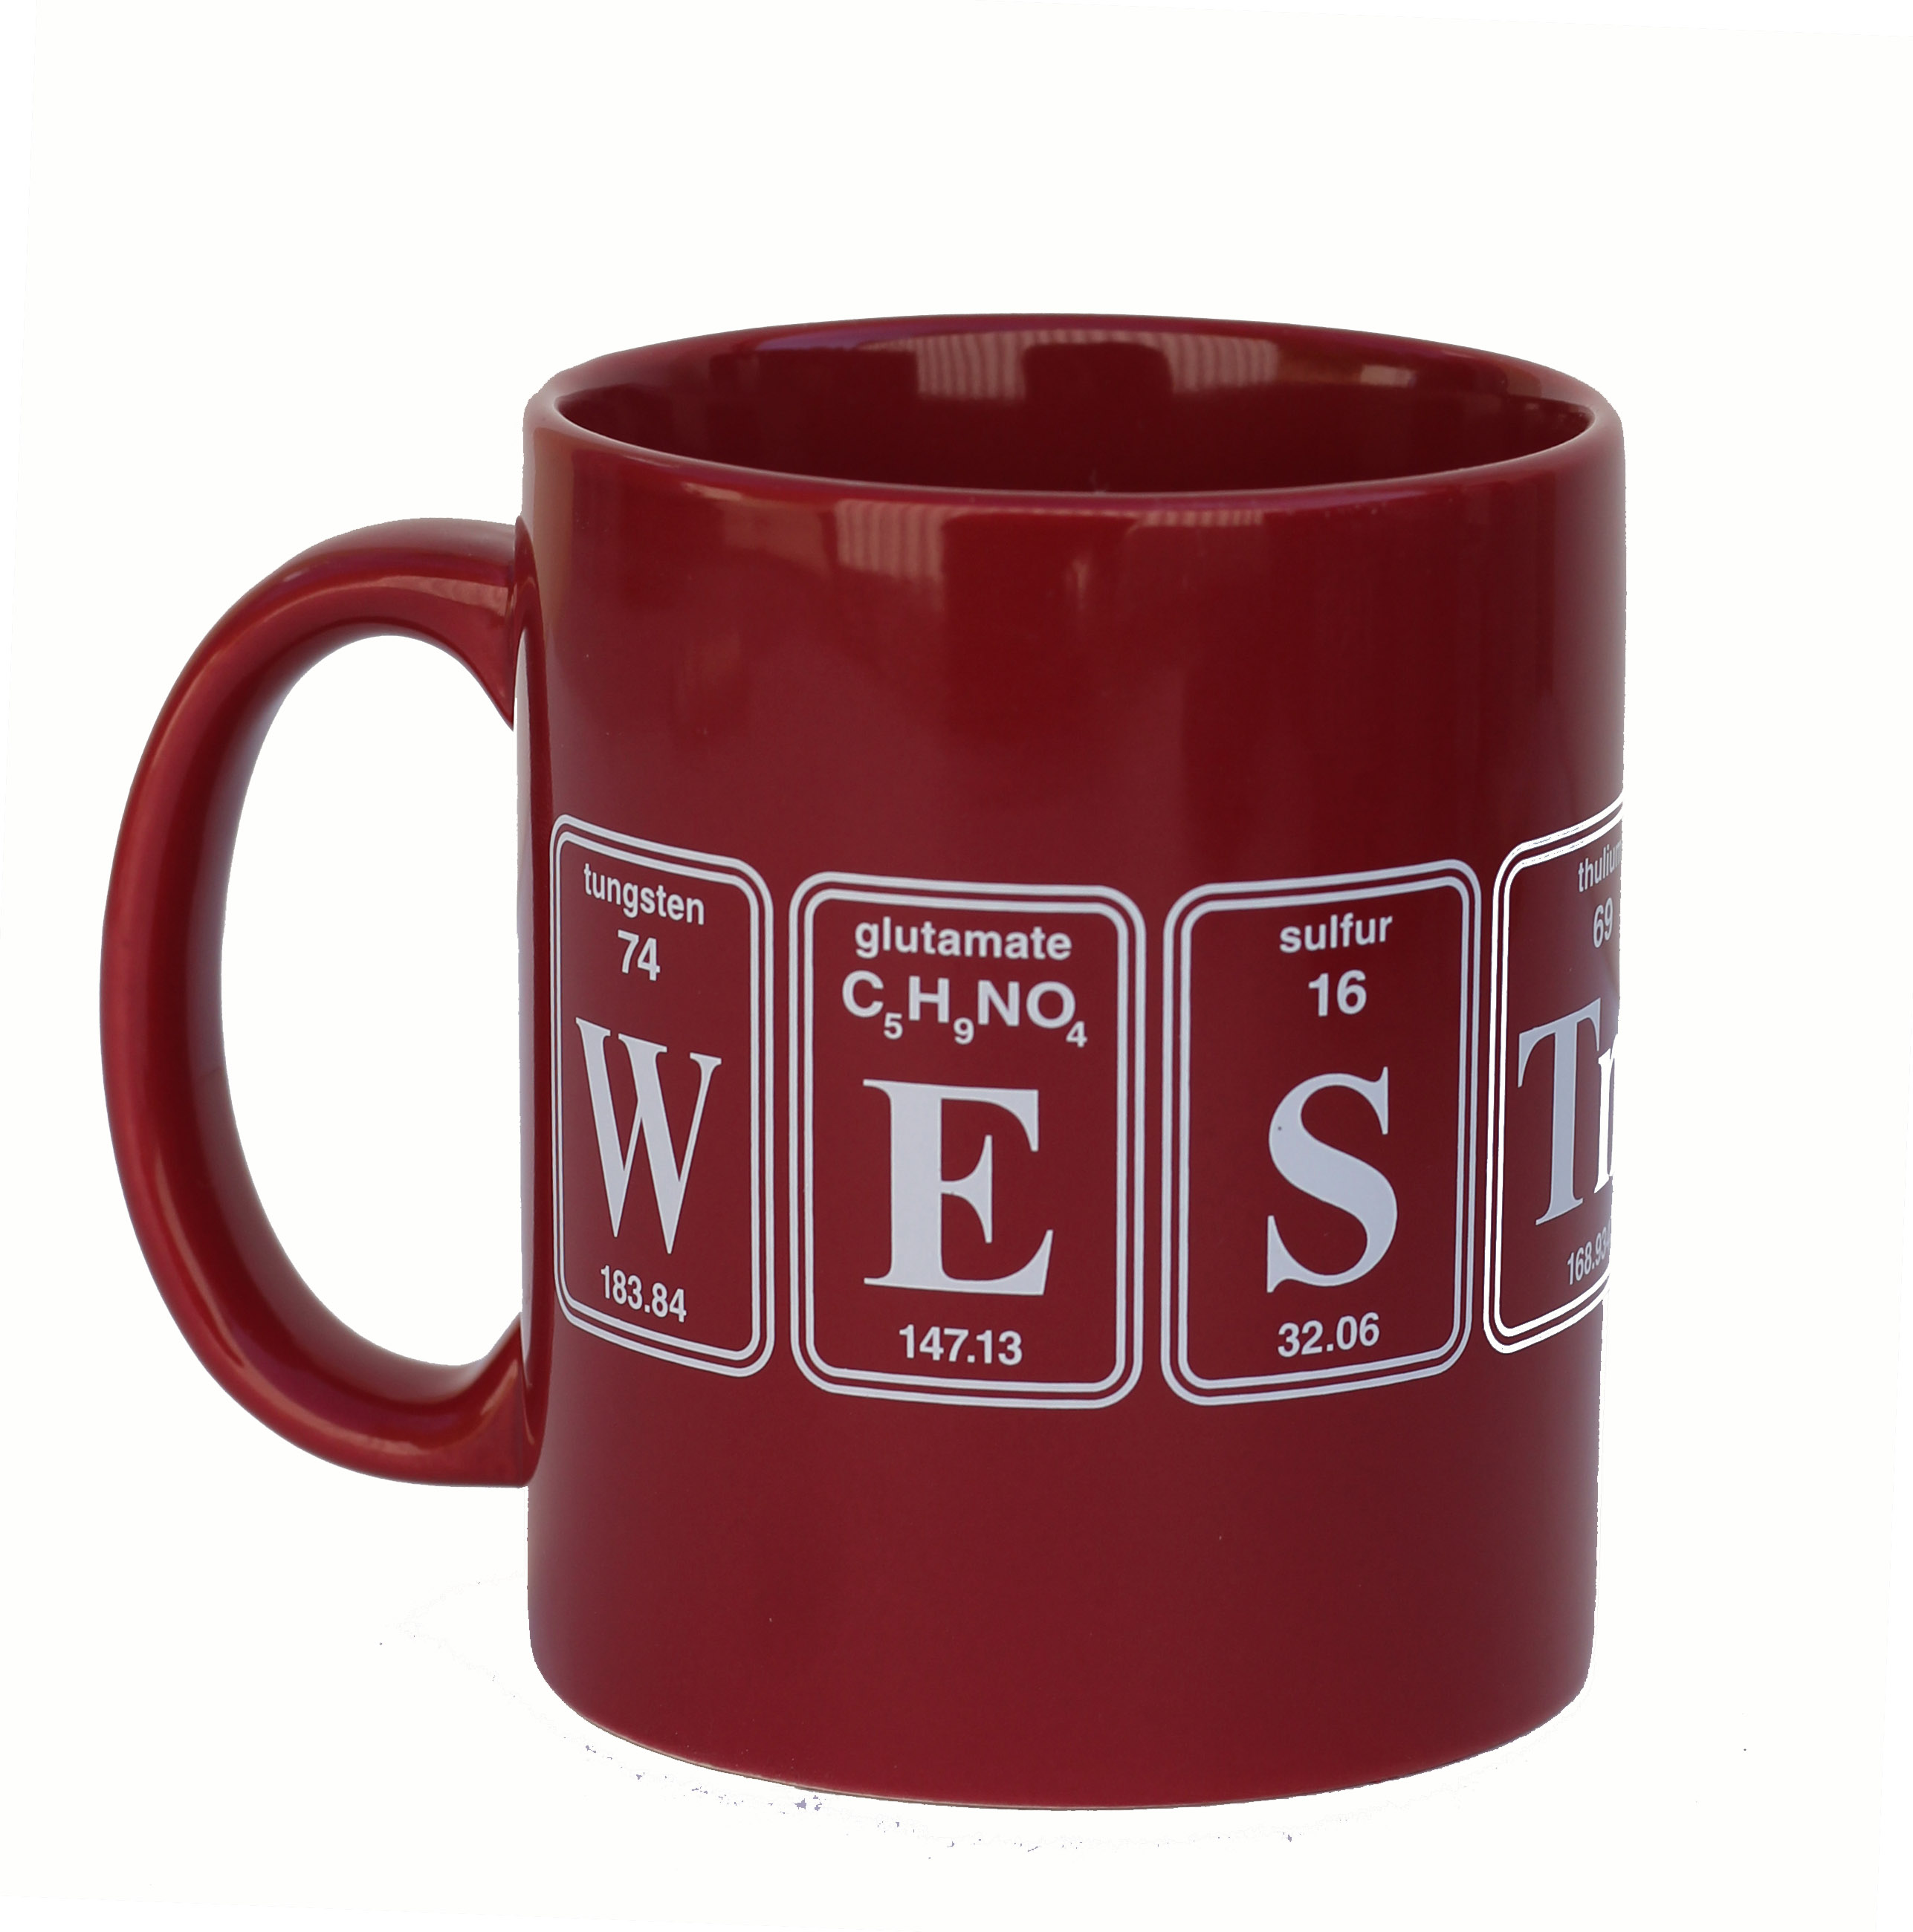 Image for the Westmont Crimson Element Mug product